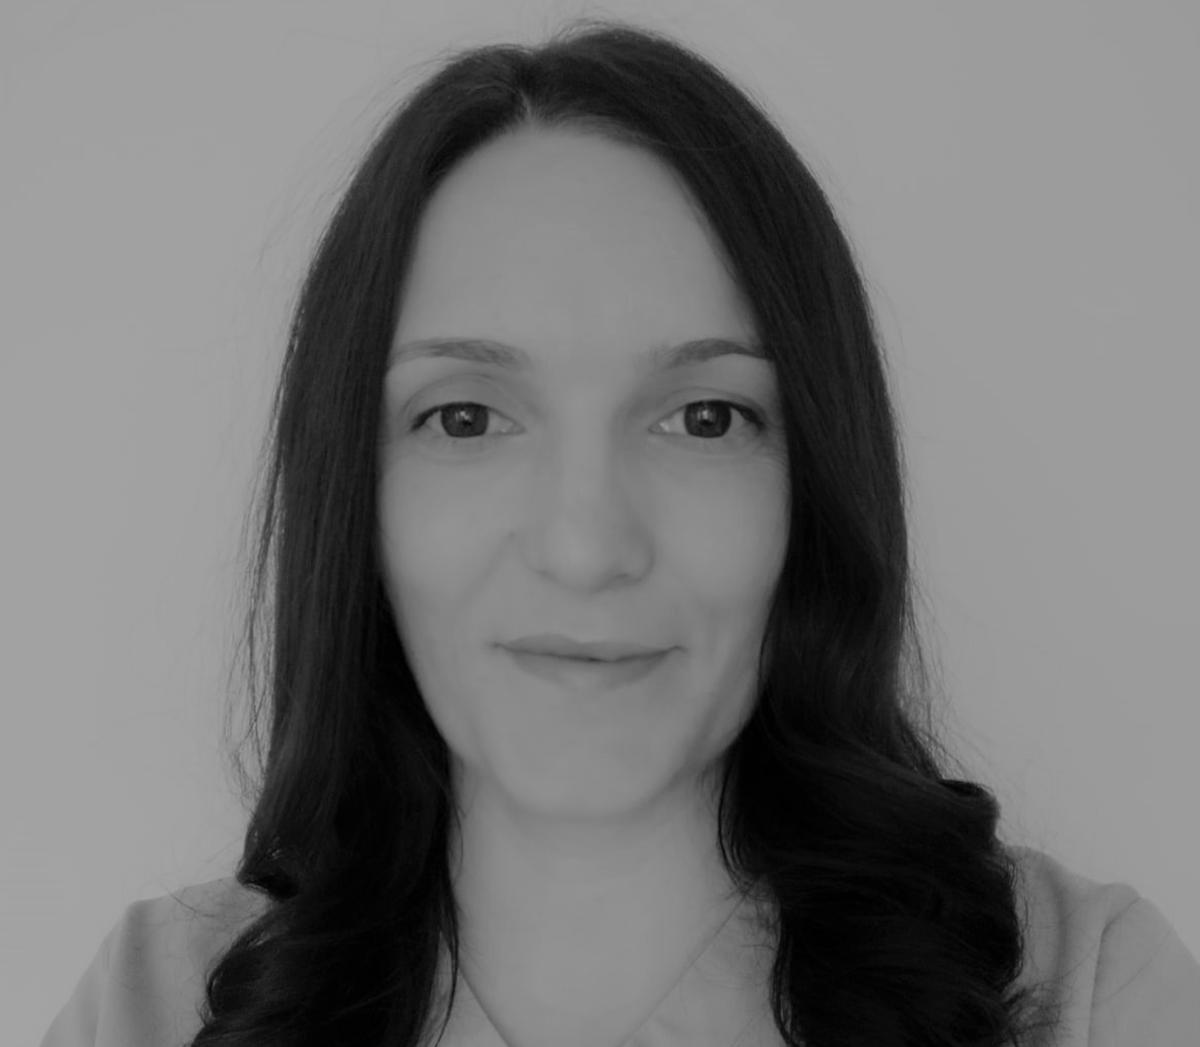 https://flossandsmile.co.uk/wp-content/uploads/2021/02/Floss-and-Smile_team-04-1.png